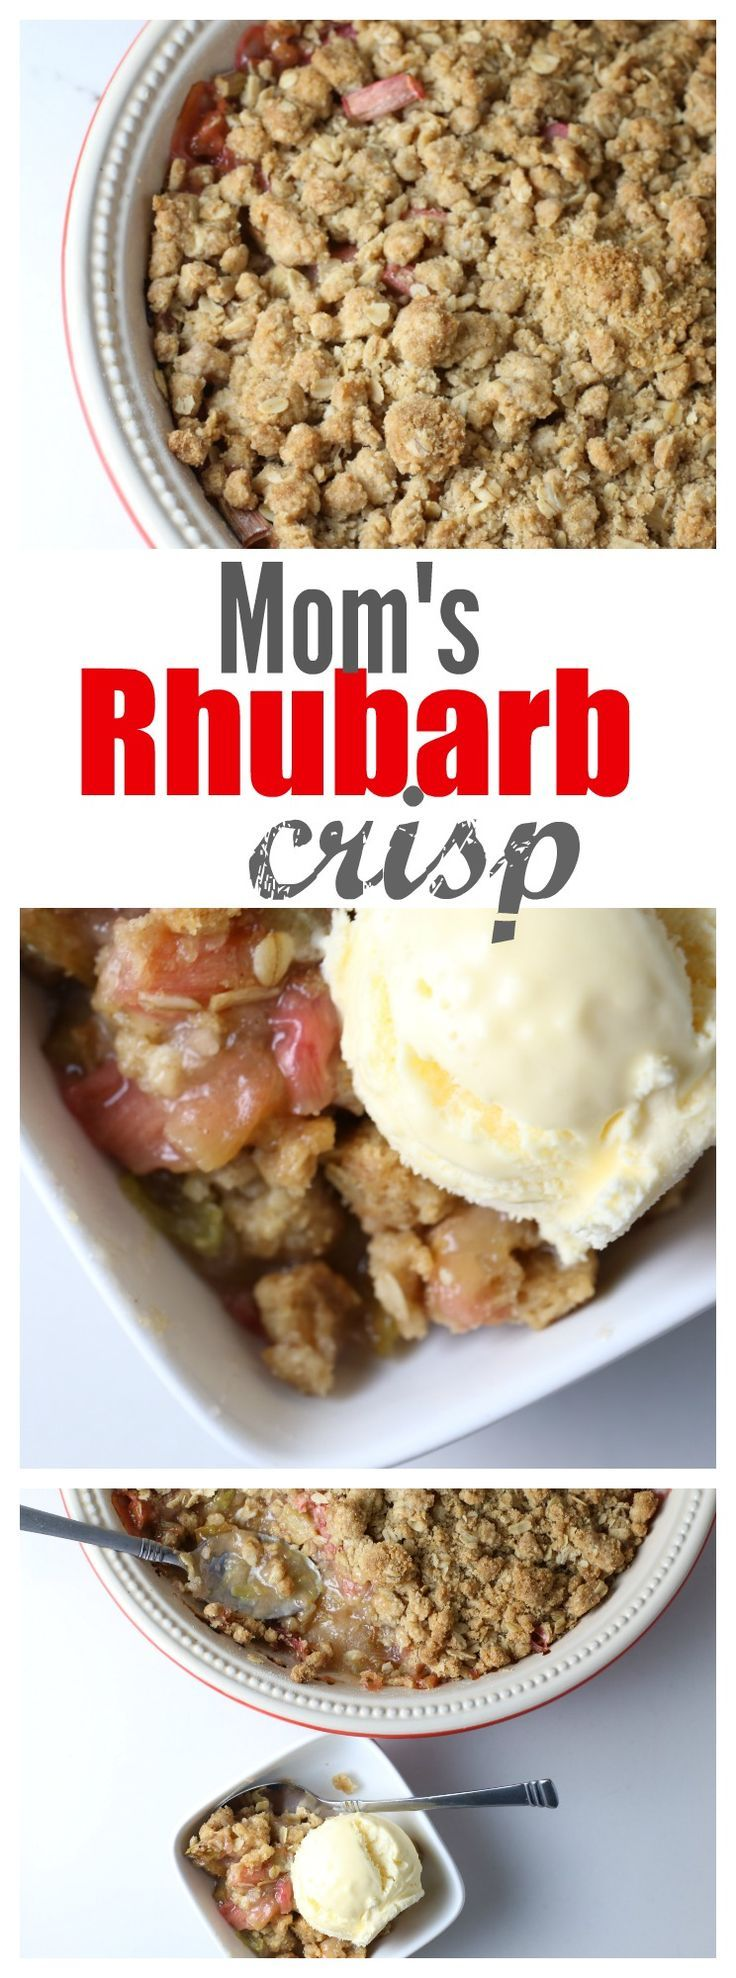 Moms Classic Rhubarb Crisp